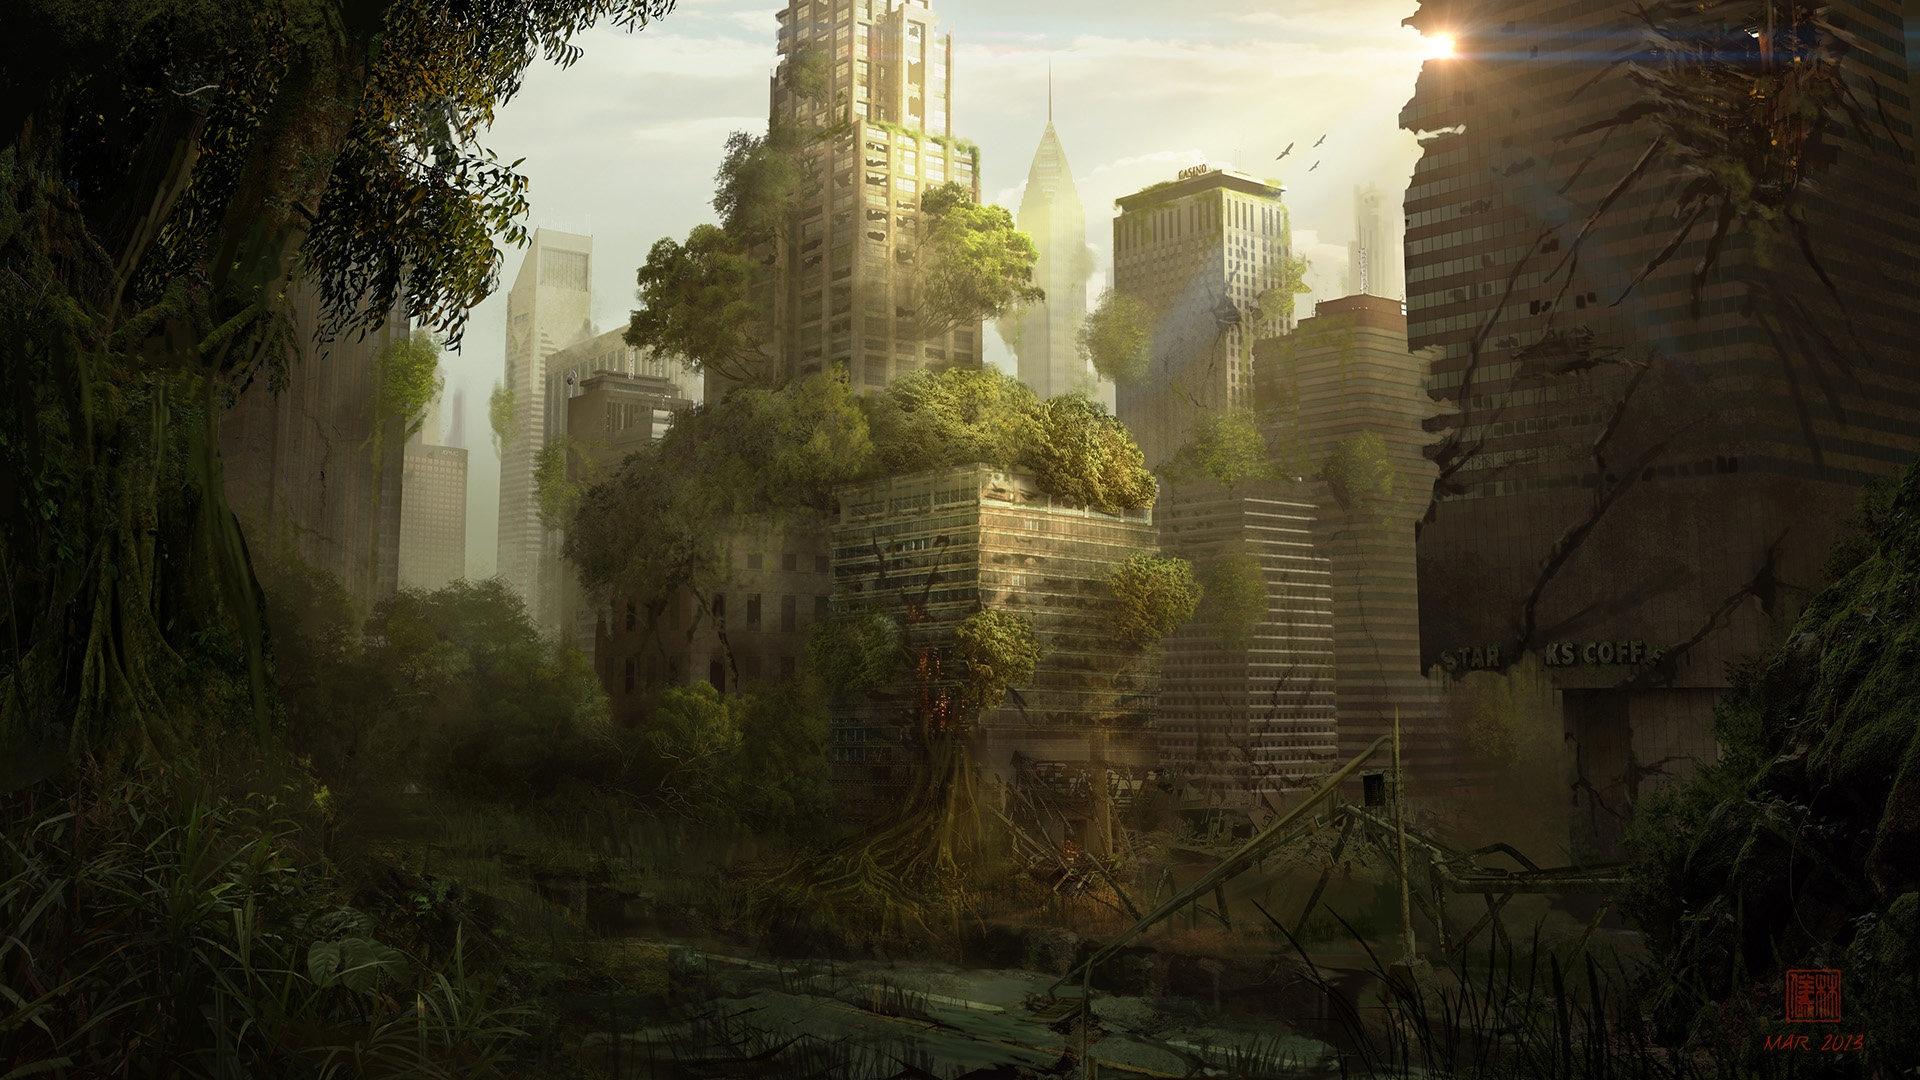 Post Apocalyptic Overgrown City wallpaper hd